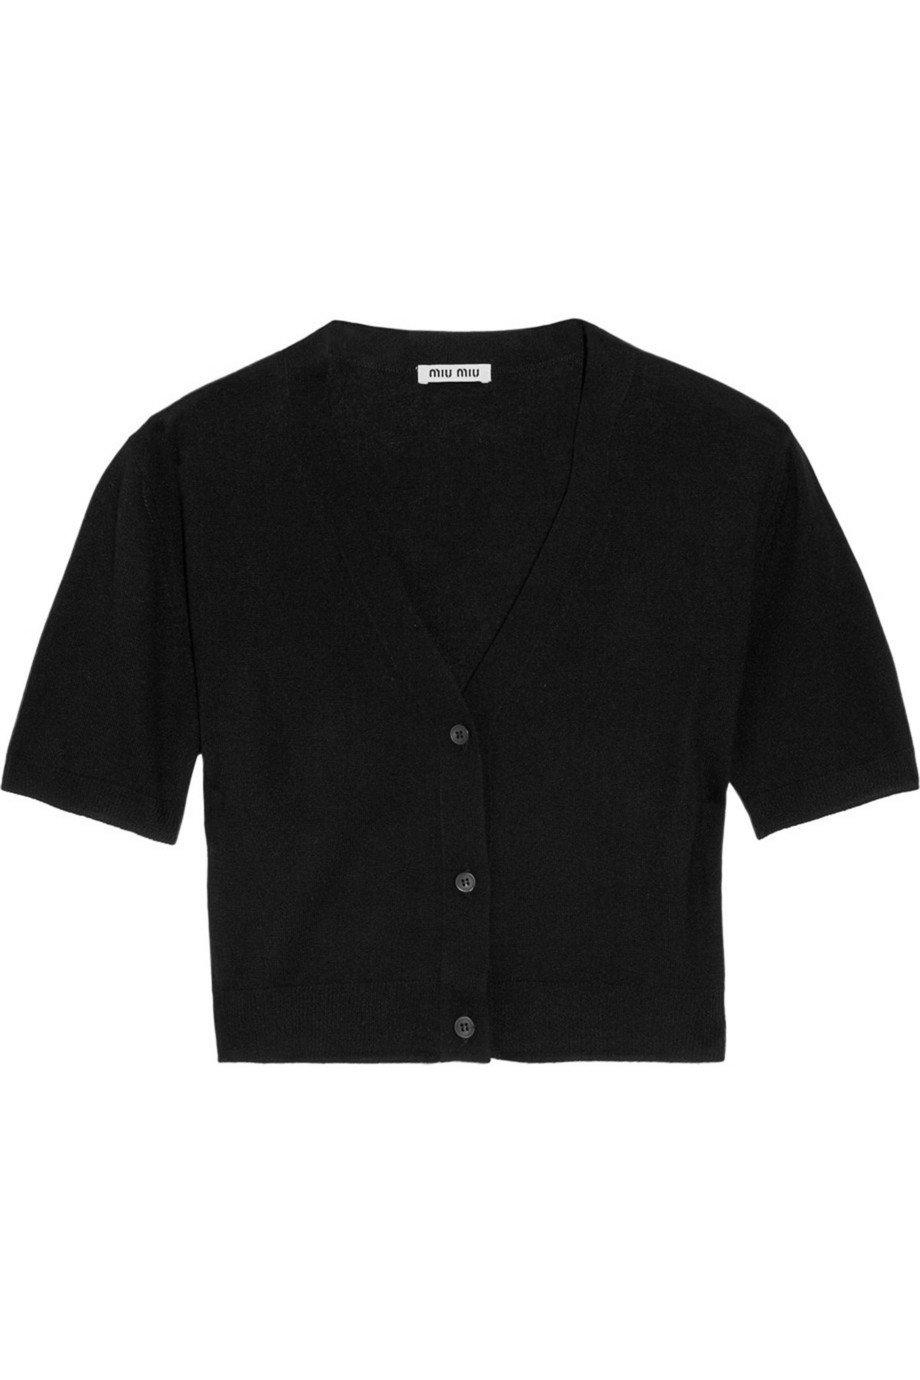 Miu Miu | Cropped cashmere and silk-blend cardigan | NET-A-PORTER.COM